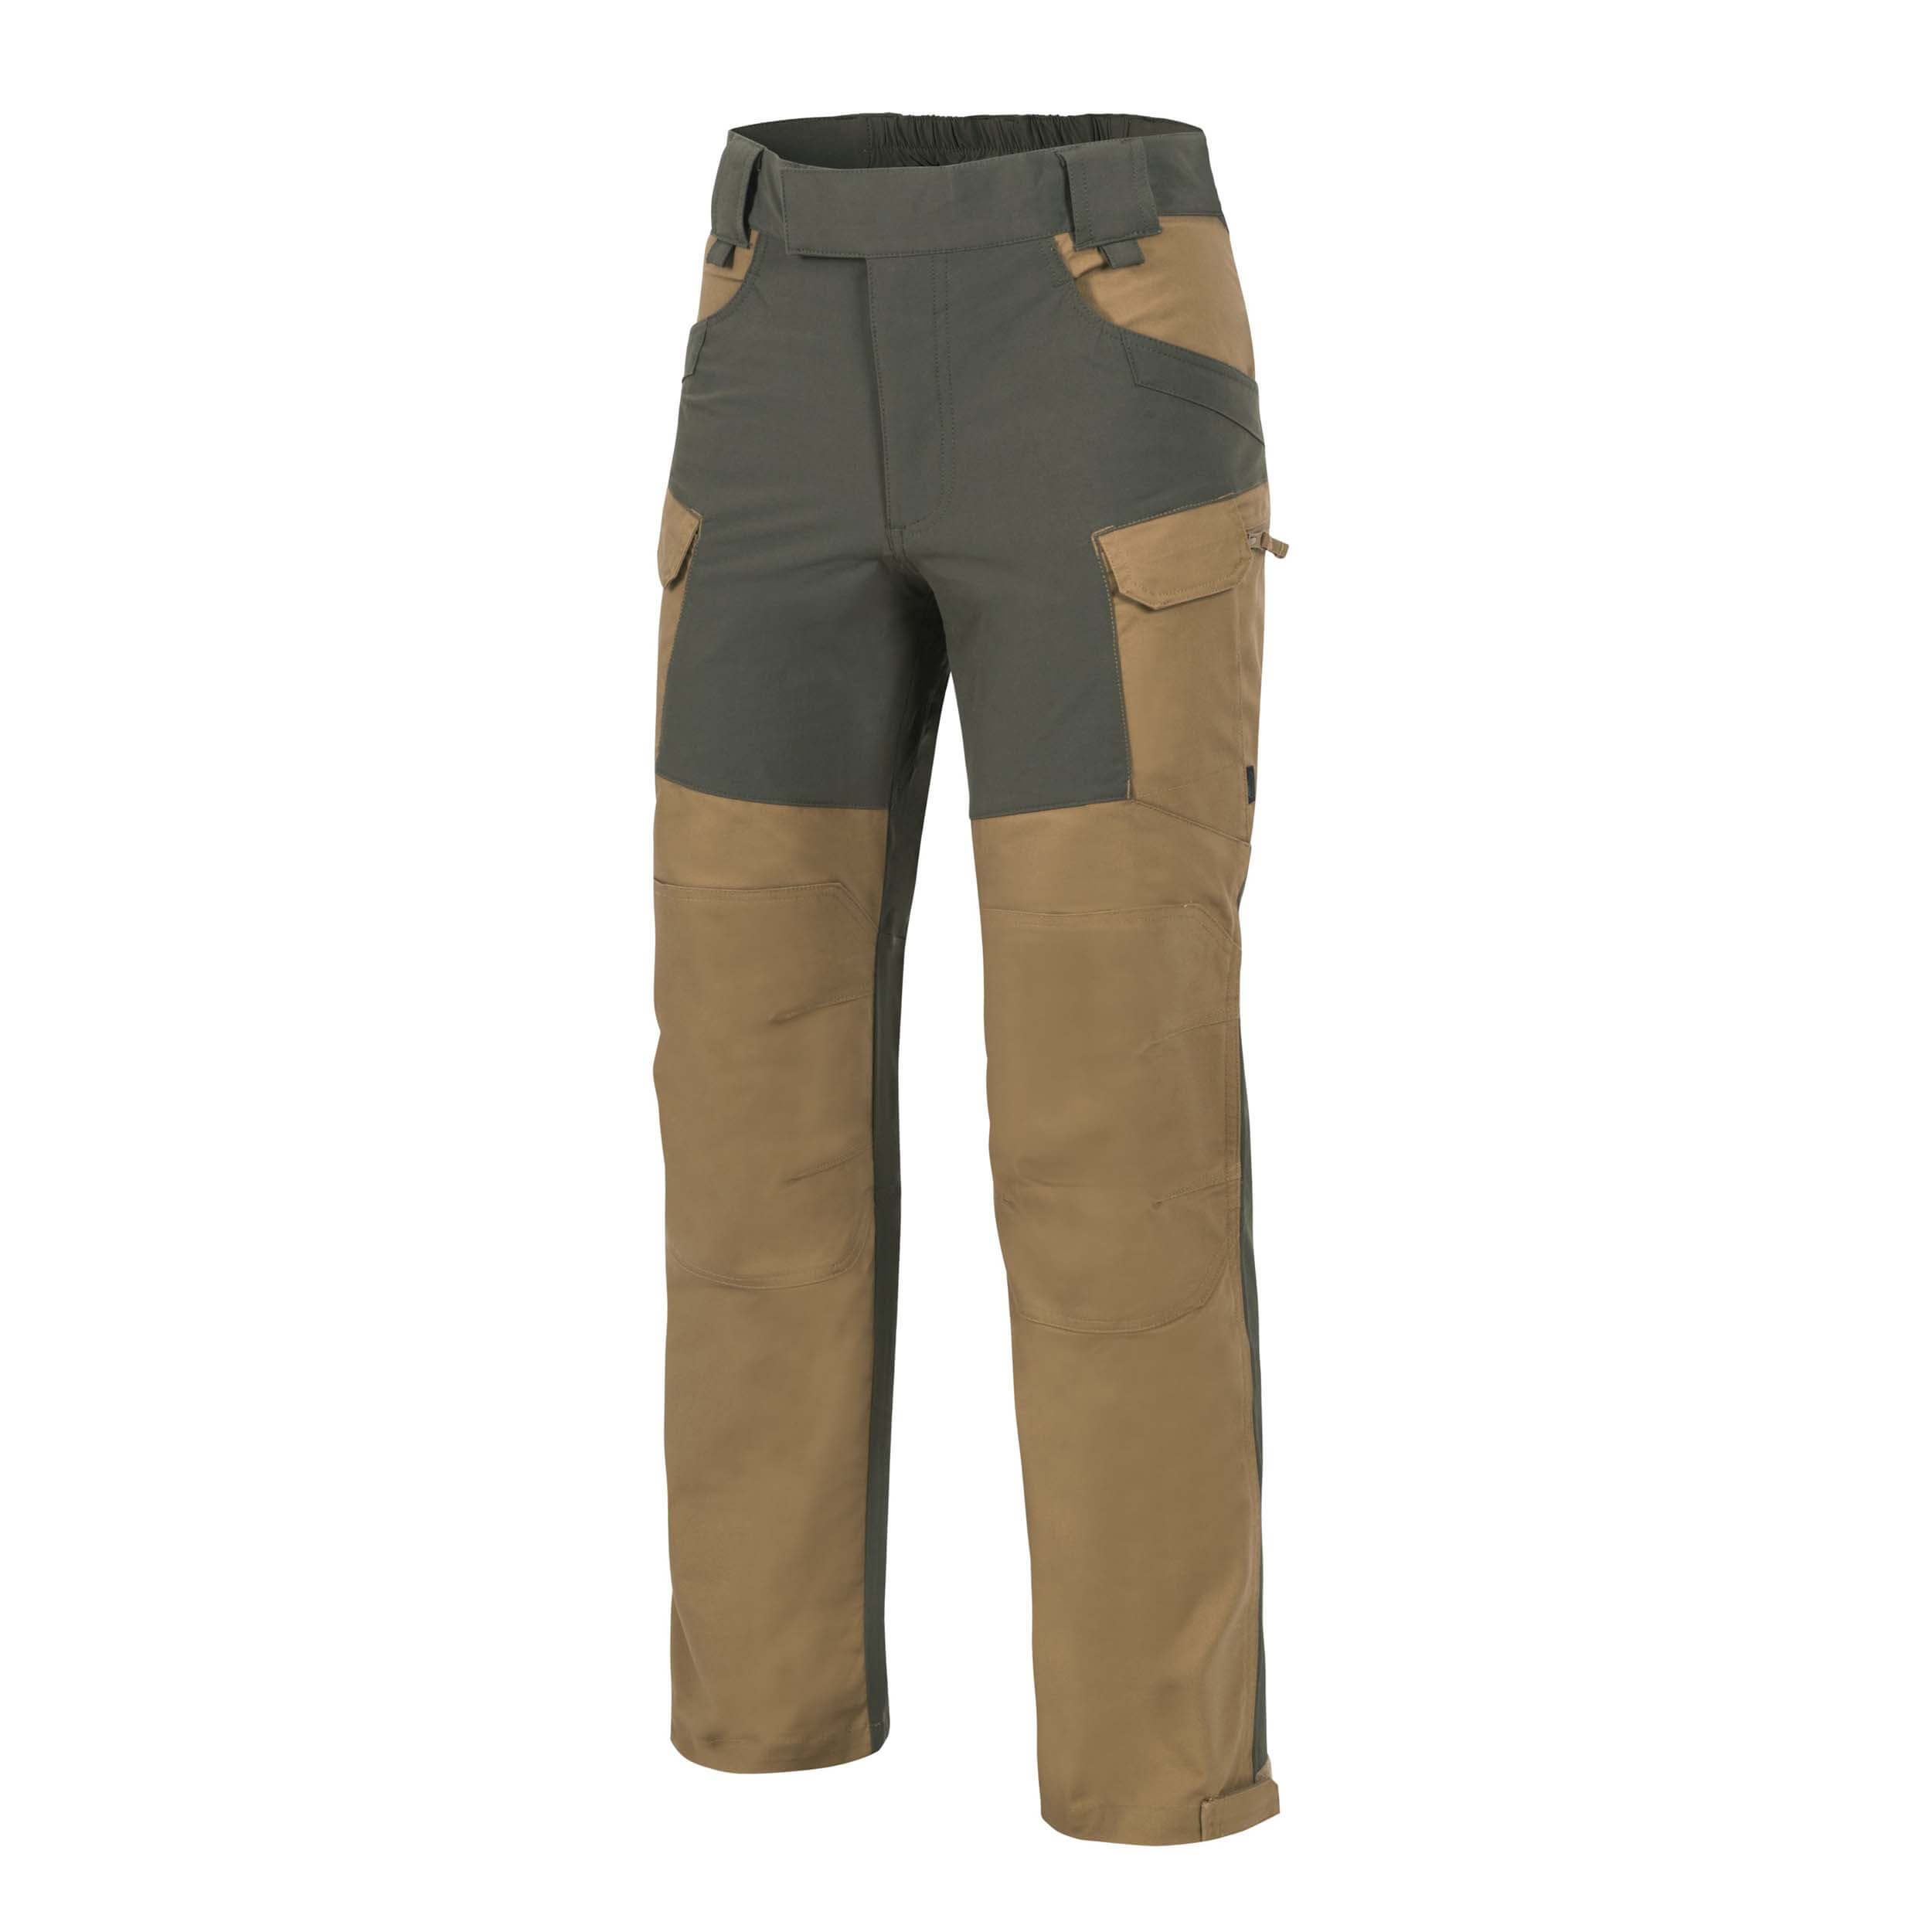 Helikon-Tex Hybrid Outback Pants - DuraCanvas - Coyote / Taiga Green A